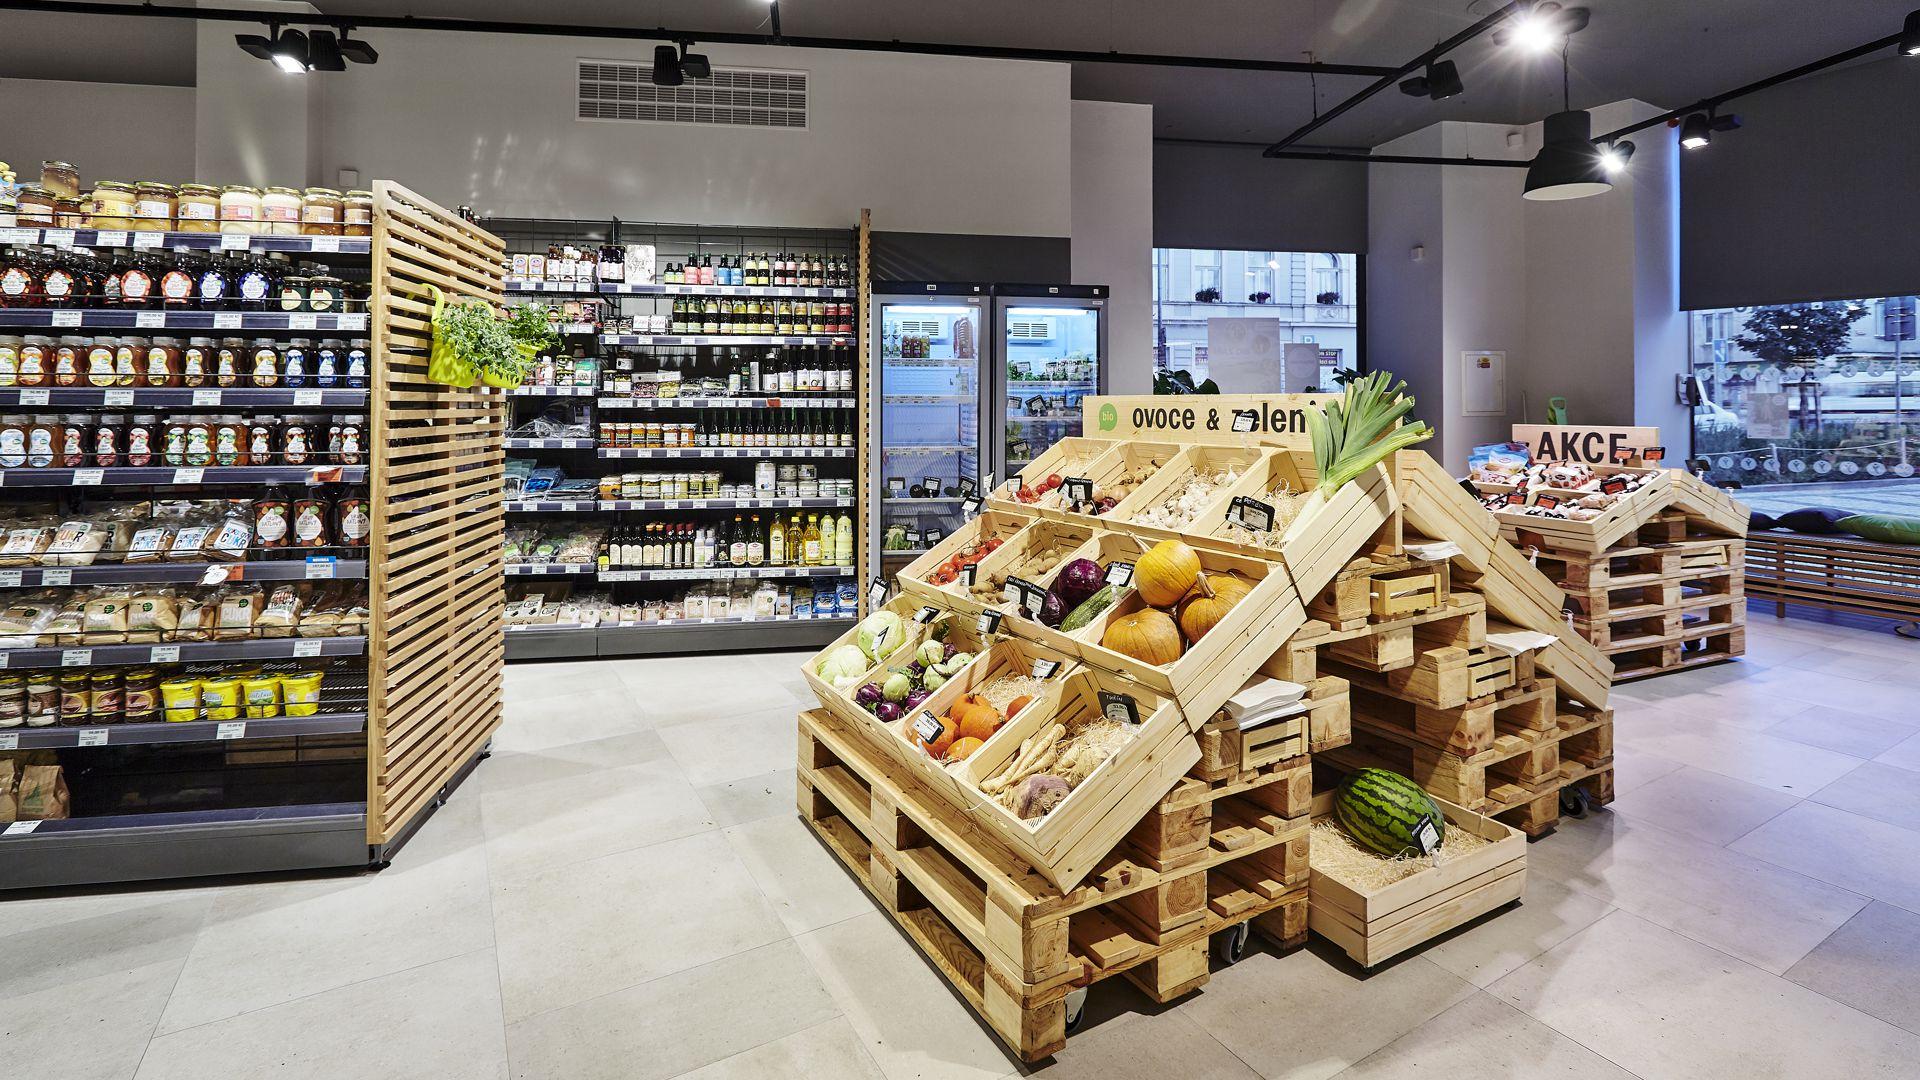 FESCHU Country Life biopotraviny a zdrava vyziva Praha Letna specializovane osvetleni ovoce zelenina